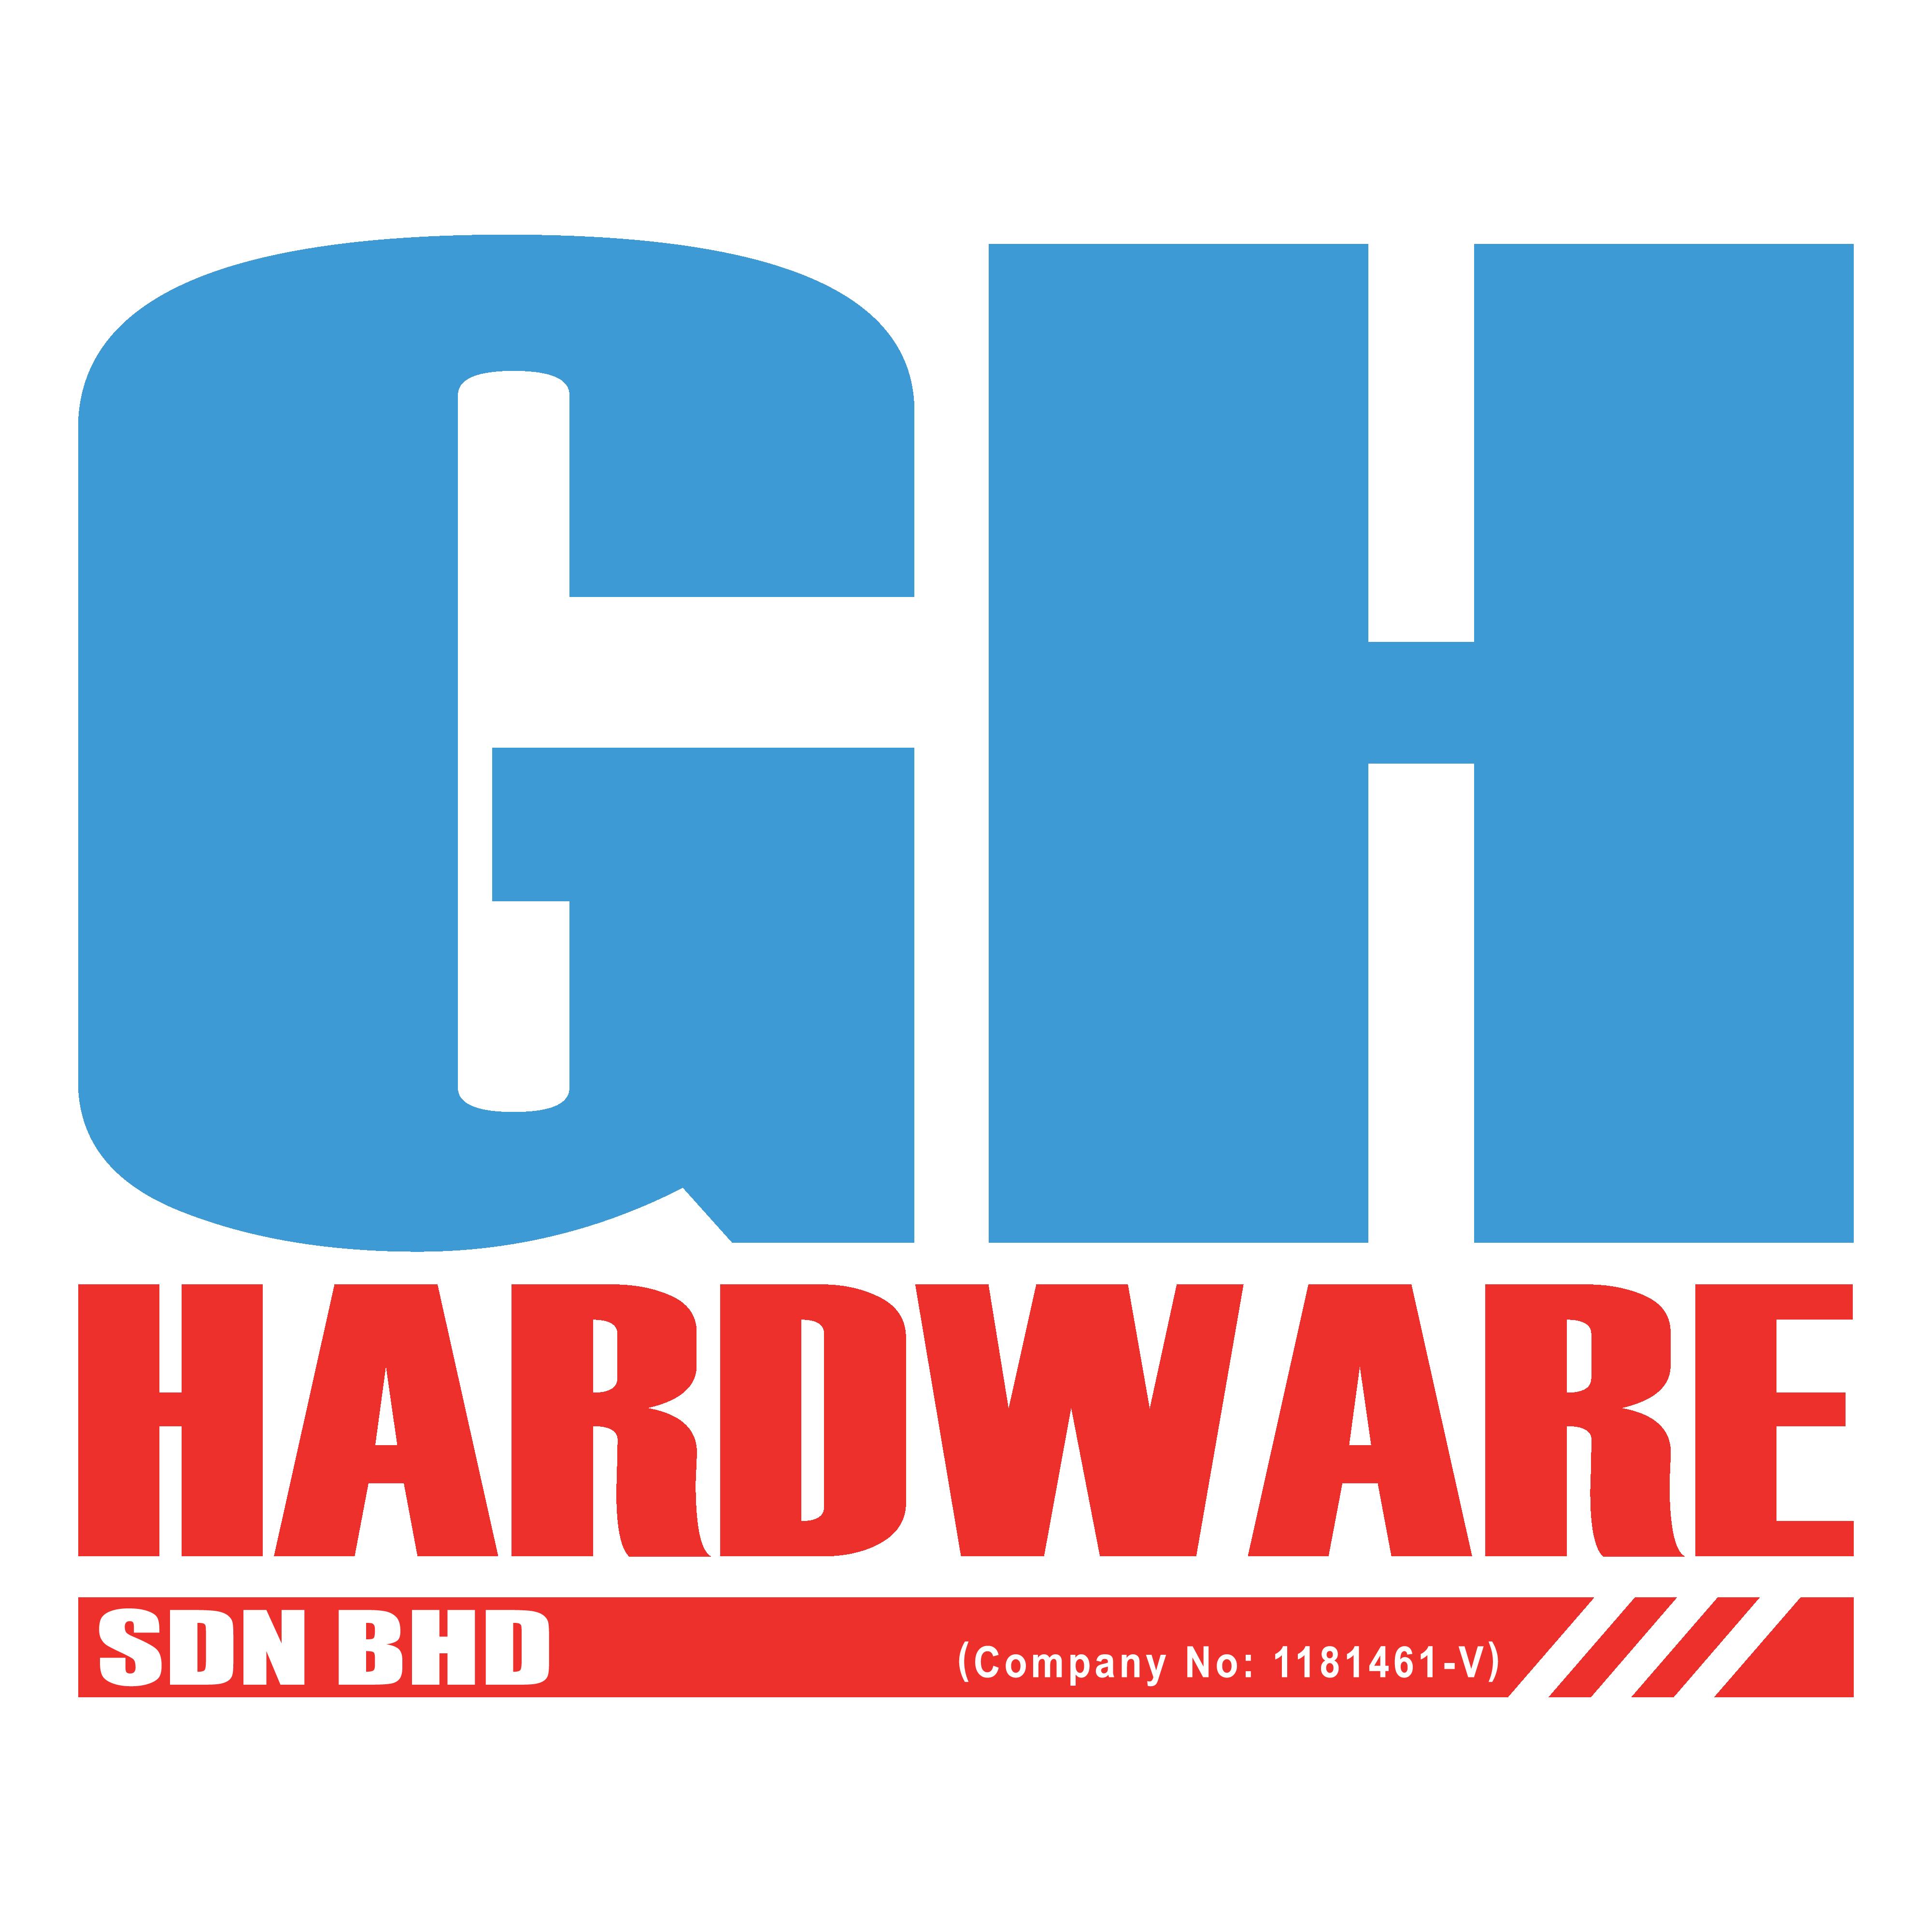 GH Hardware Sdn bhd